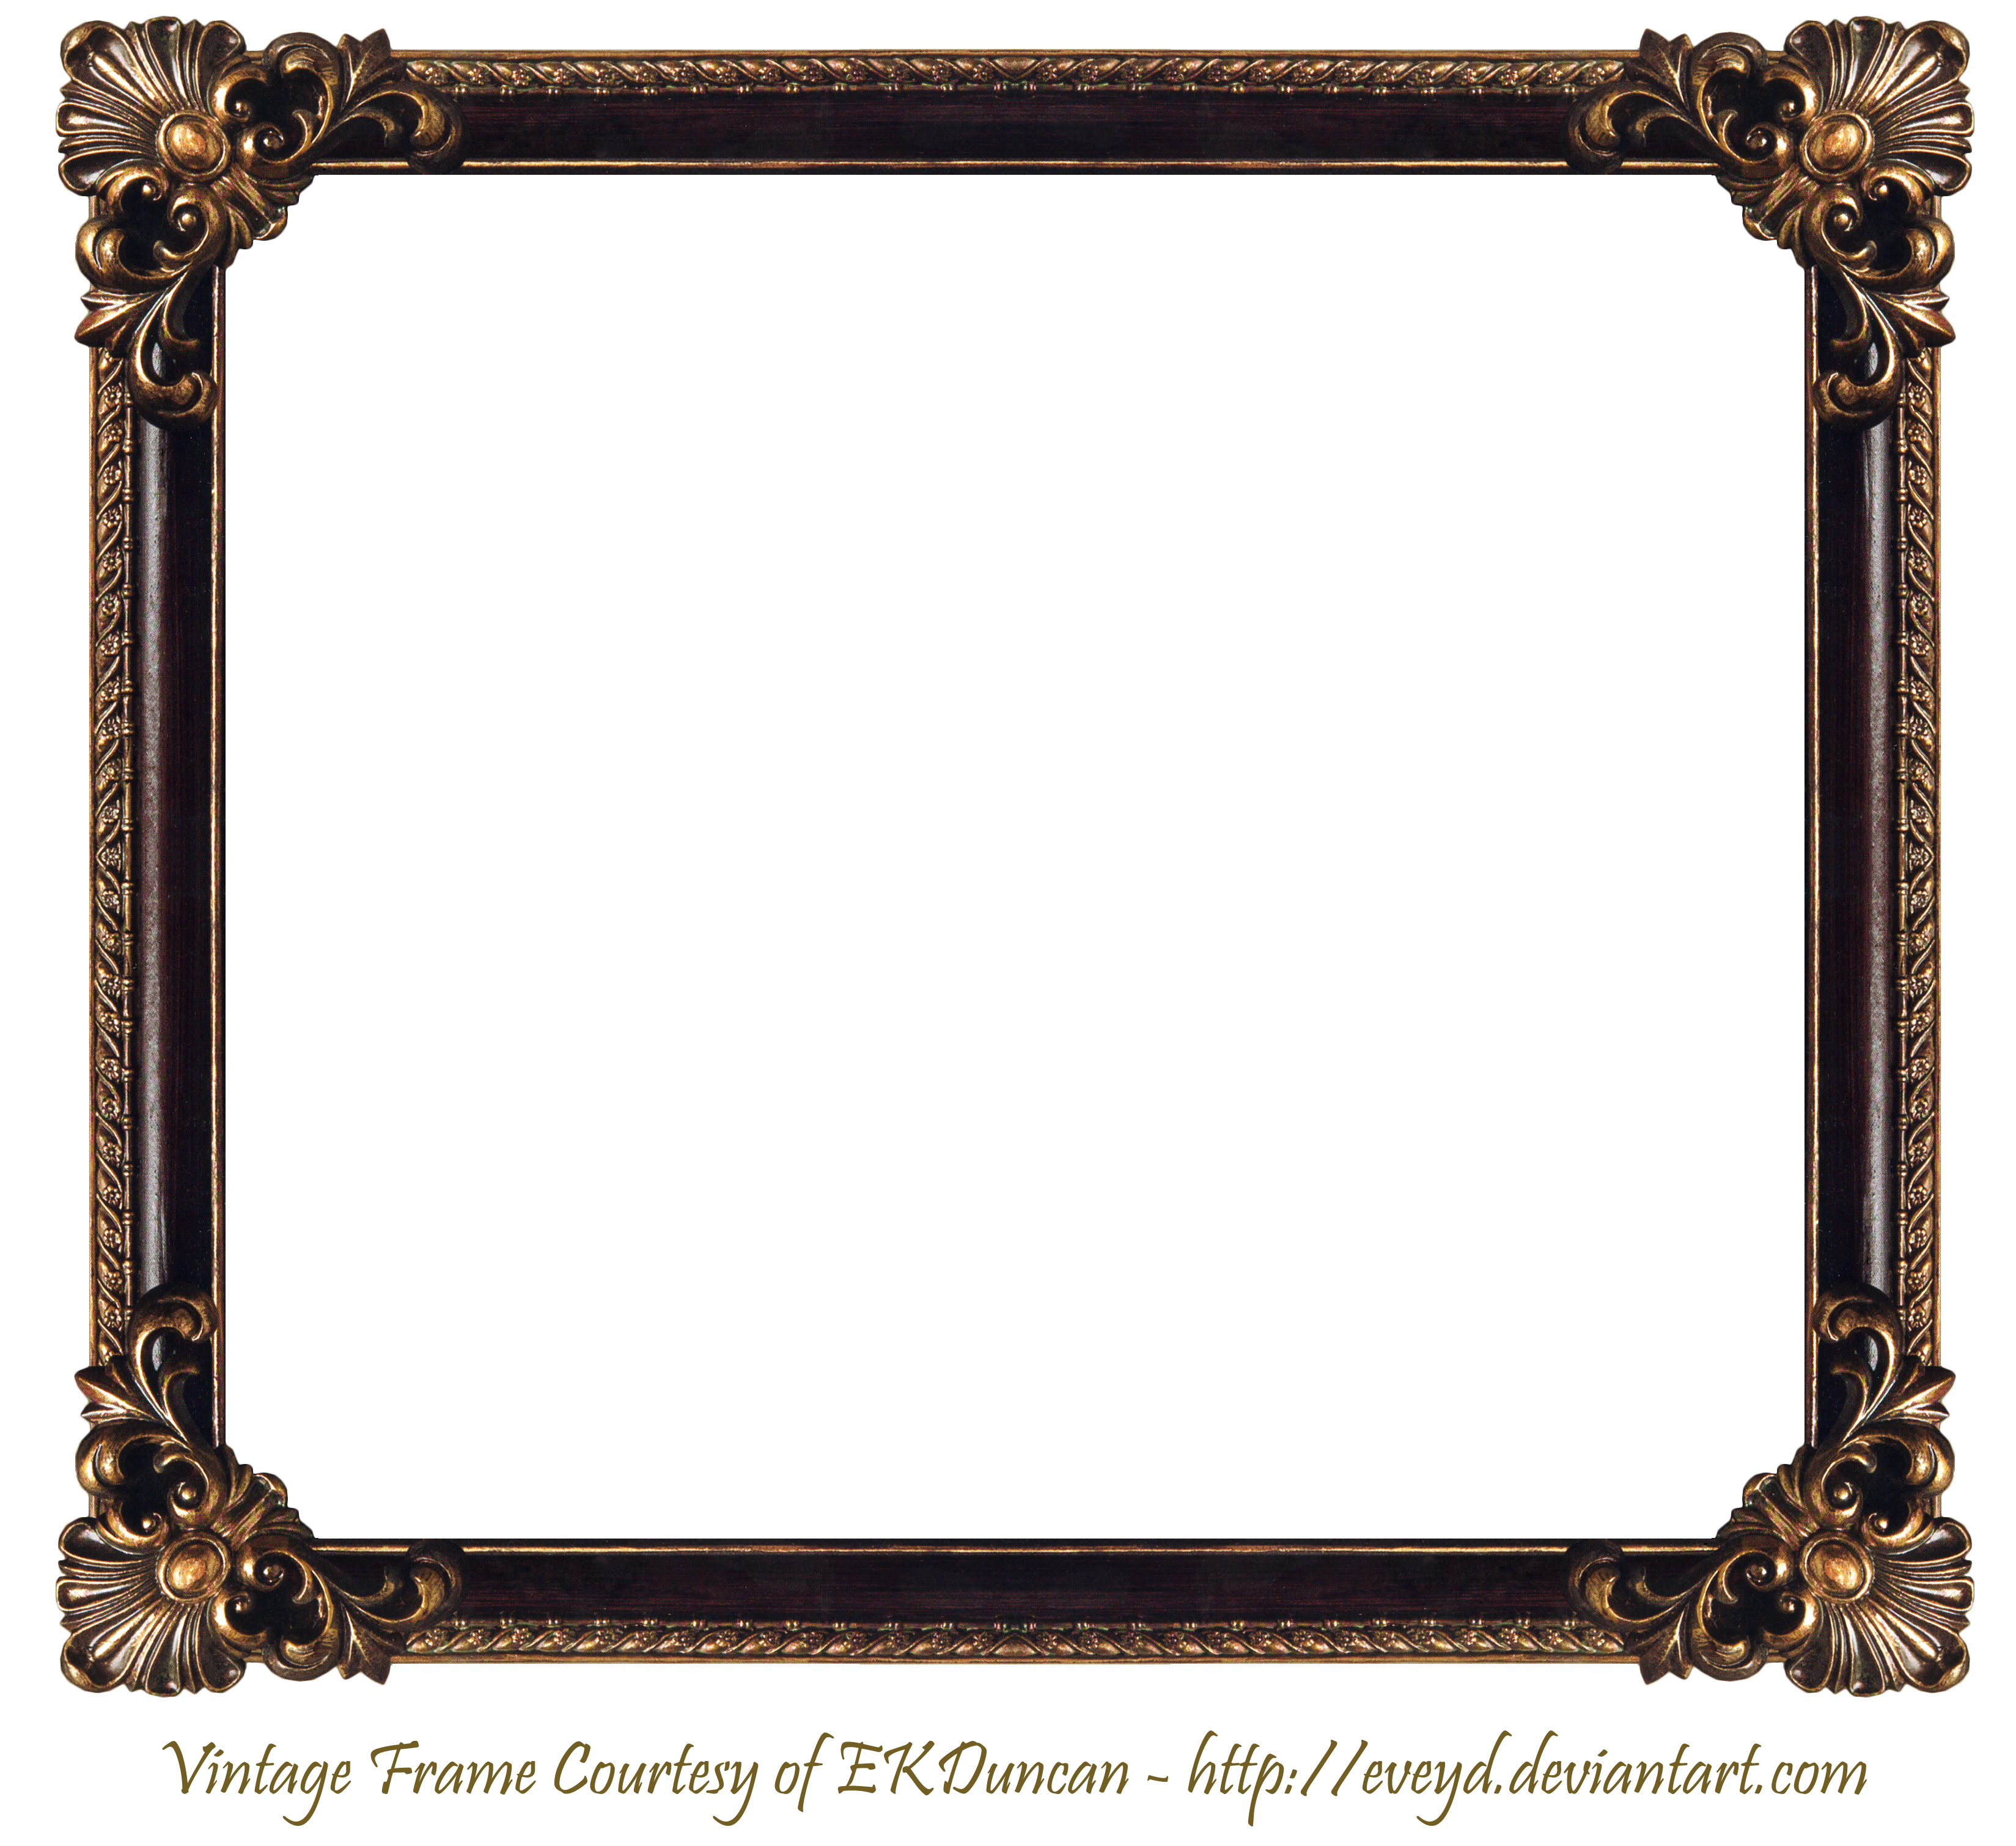 Elaborate Wood Frame By Ekduncan By Eveyd D50td7q Png 3298 3020